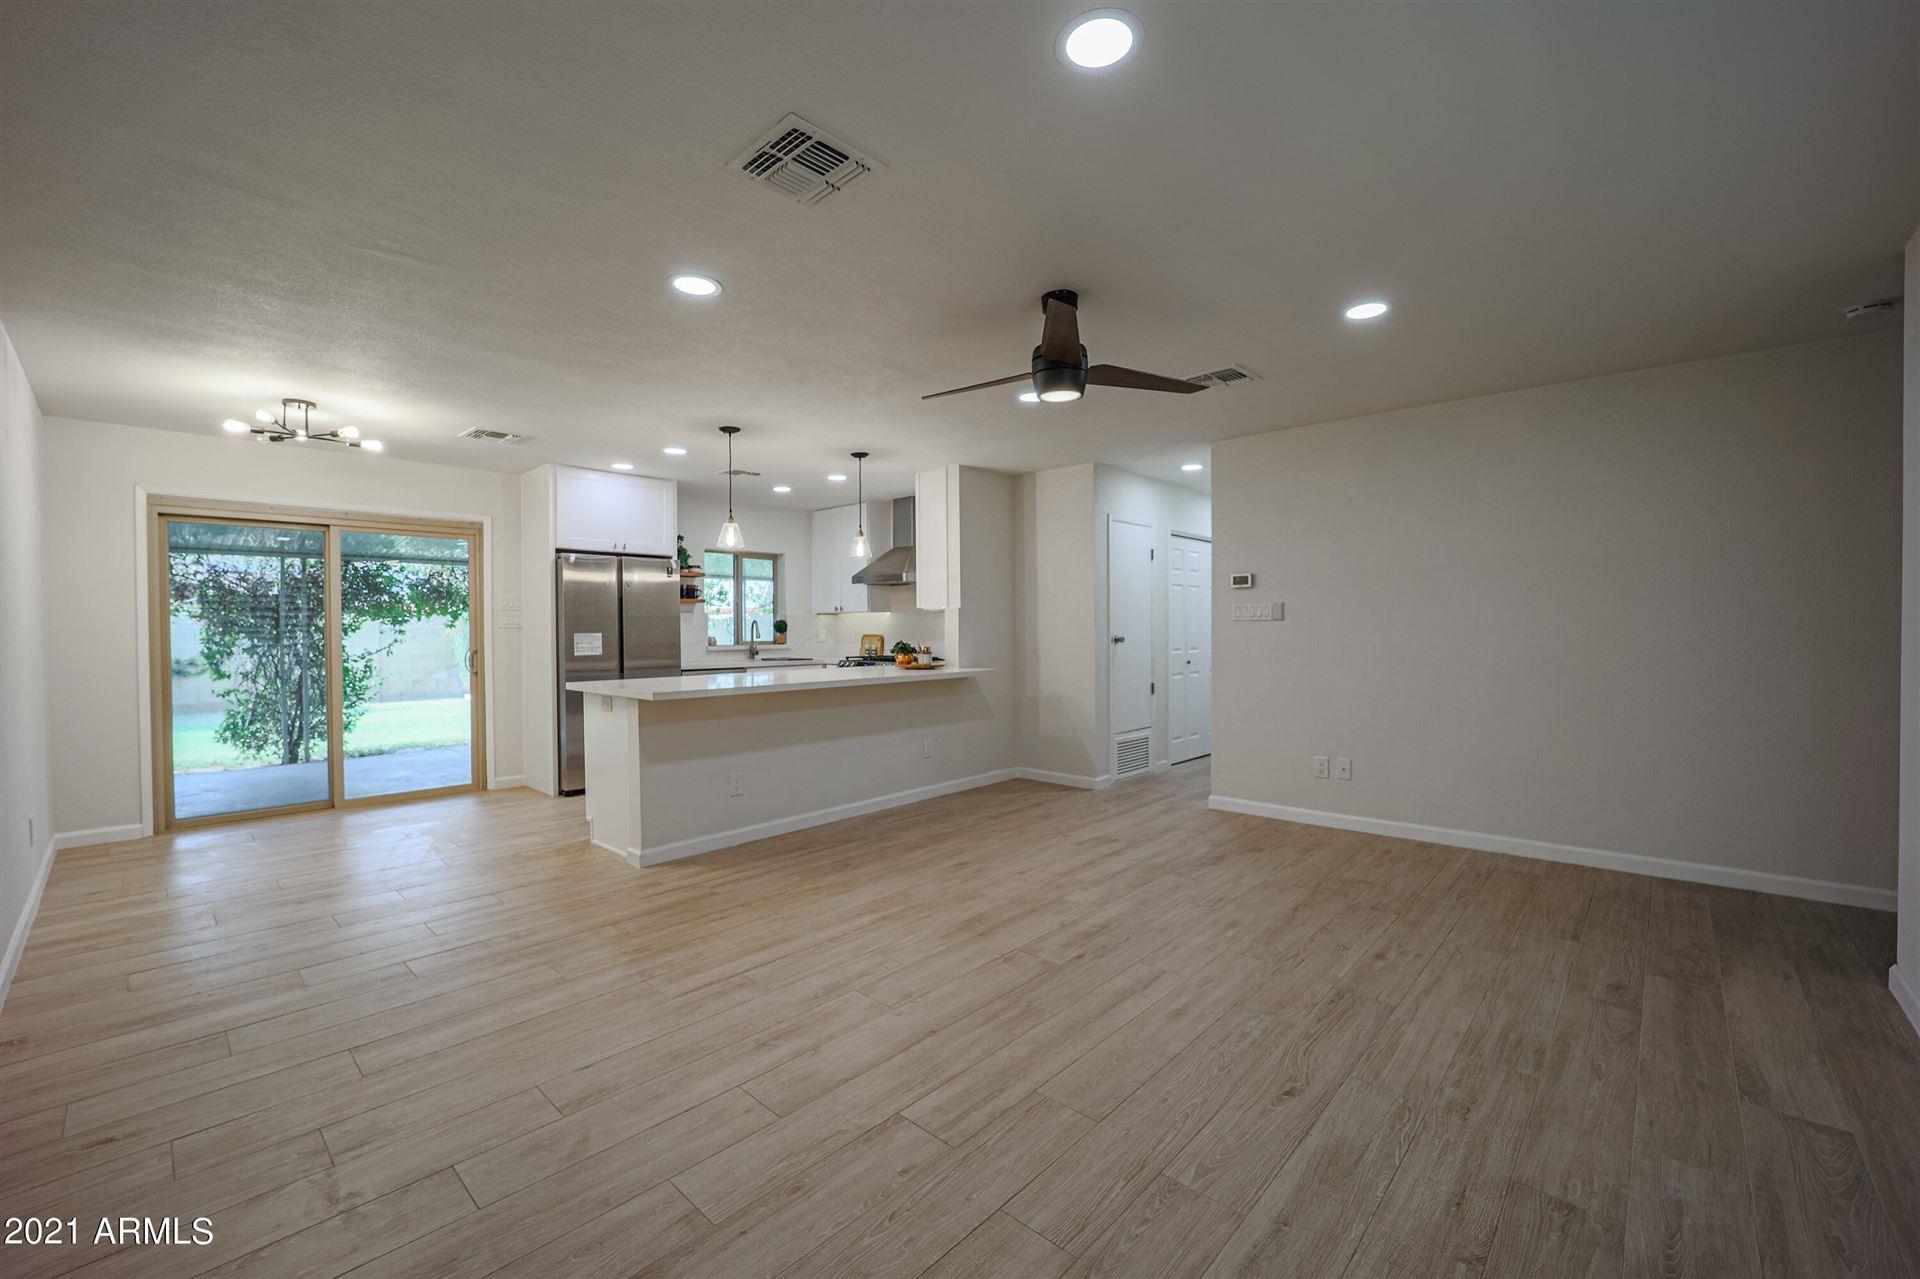 7244 E CORONADO Road, Scottsdale, AZ 85257 - MLS#: 6253406